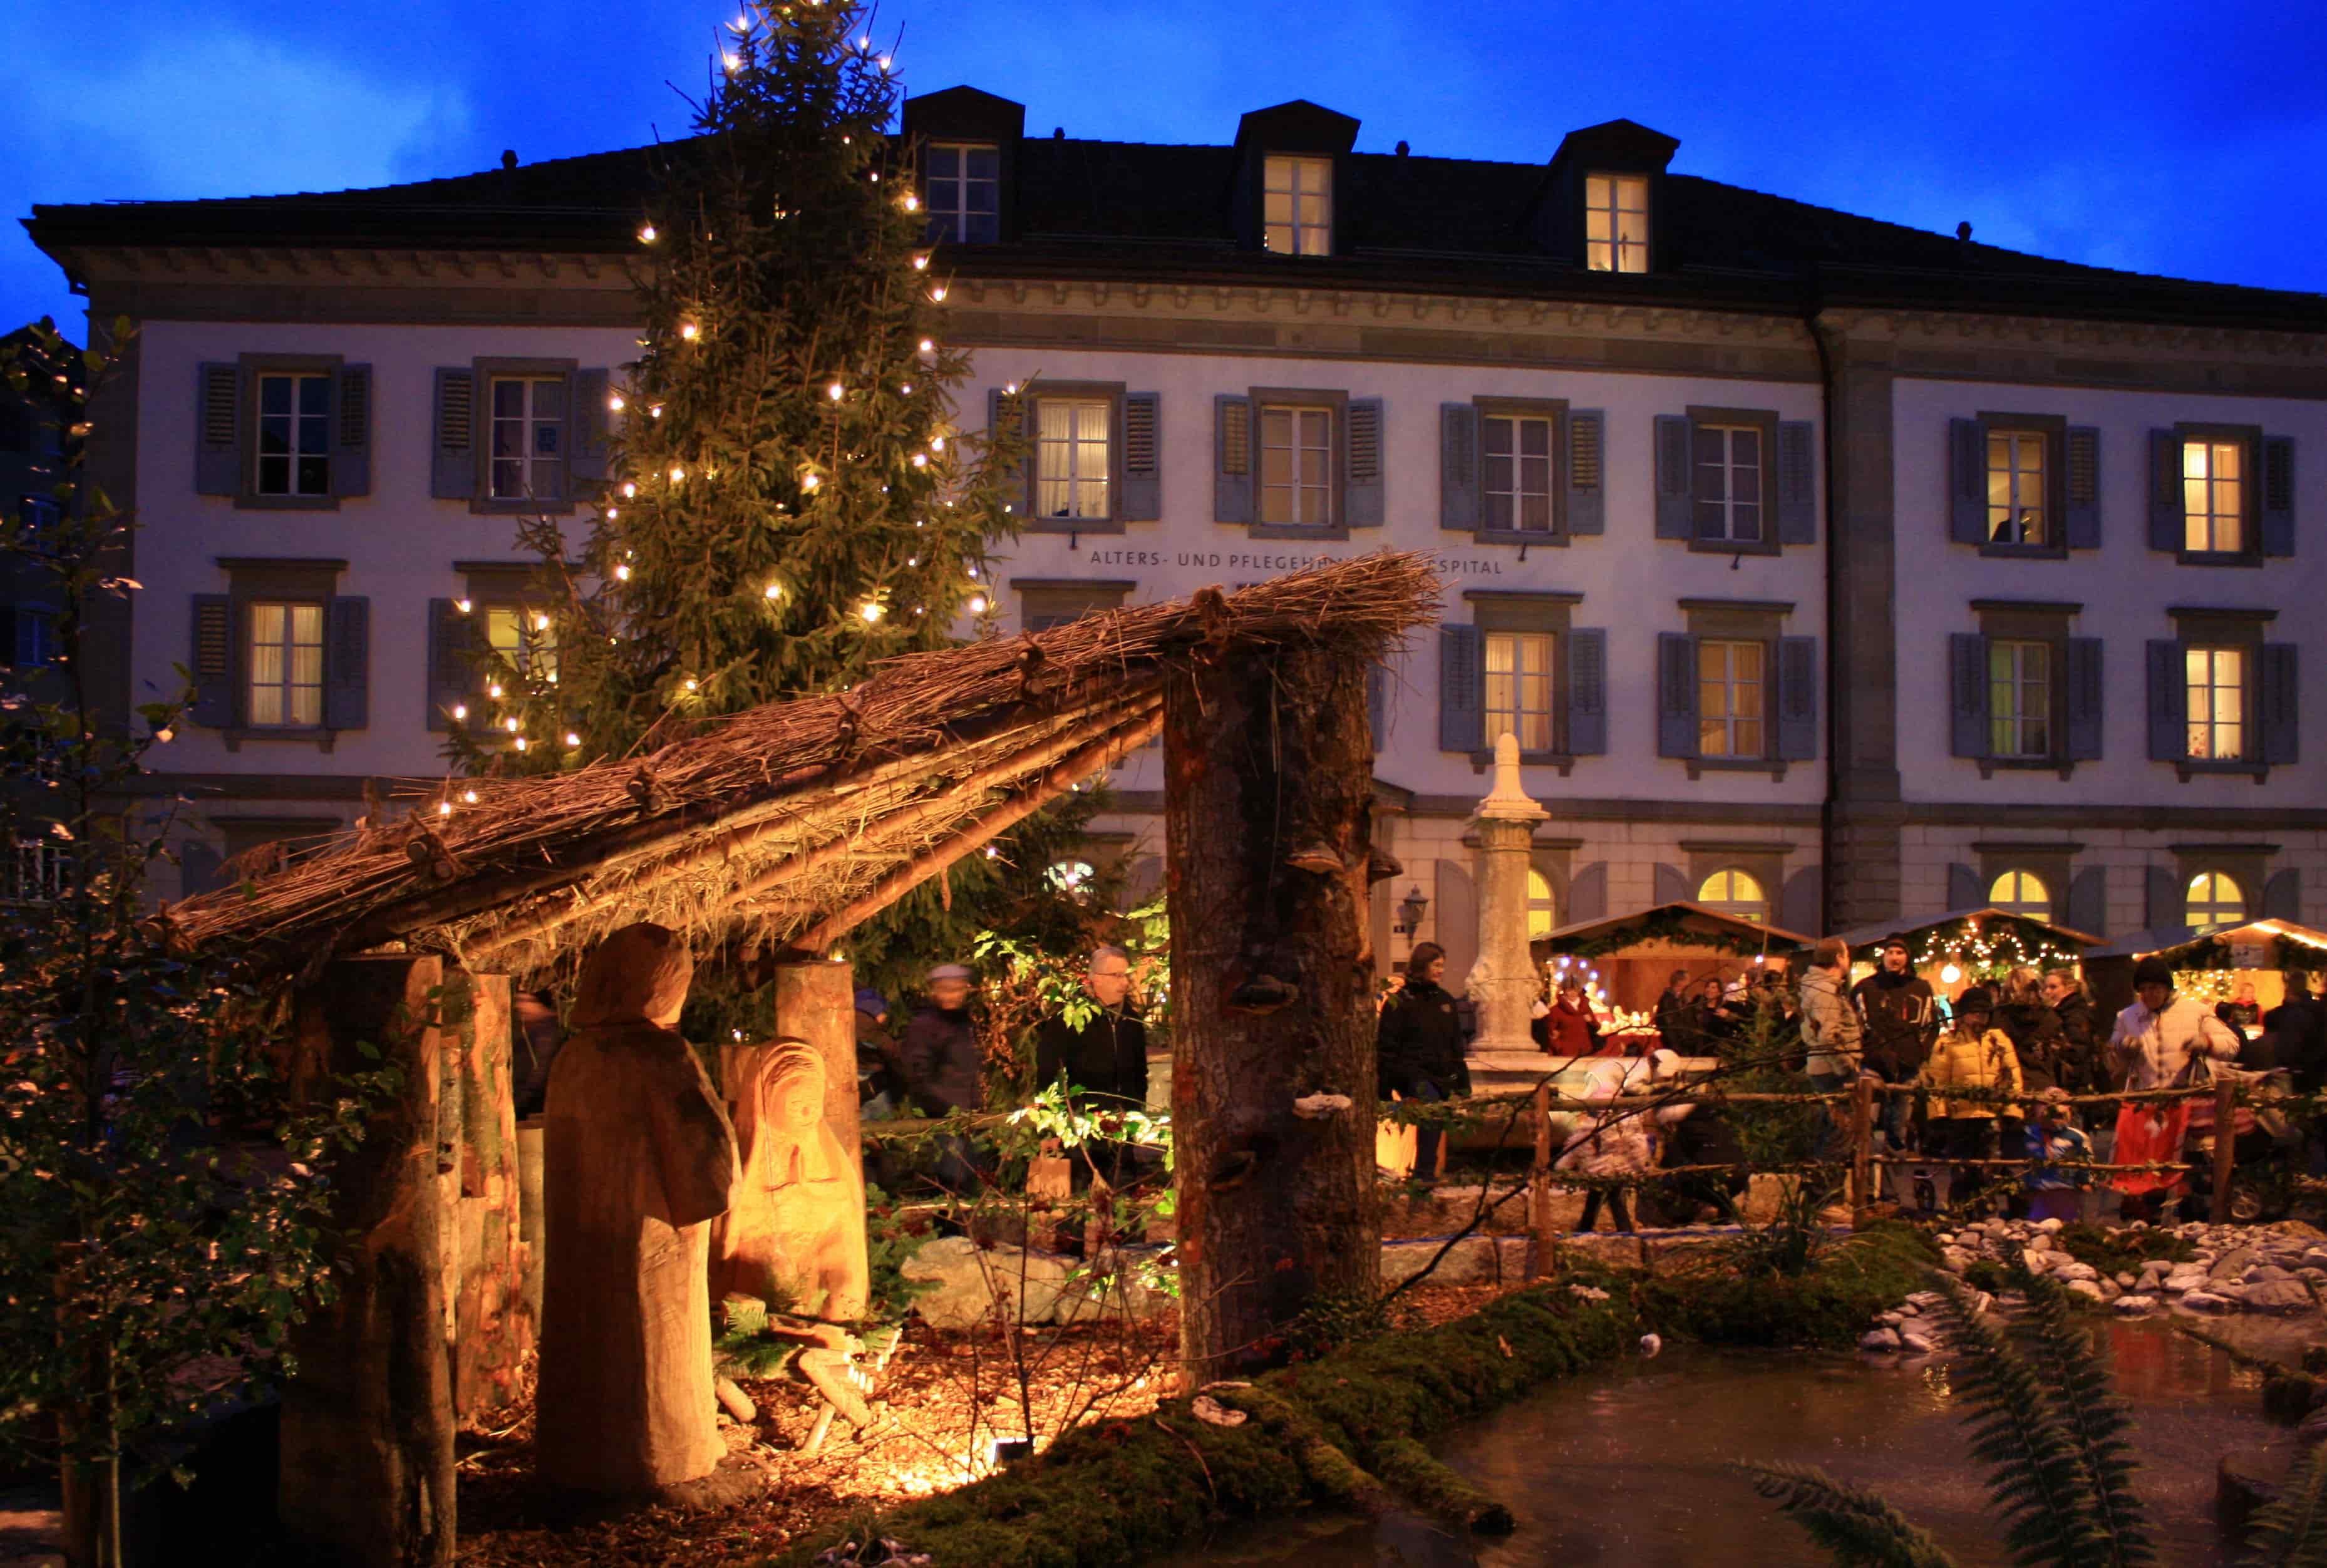 Christmas market in Switzerland